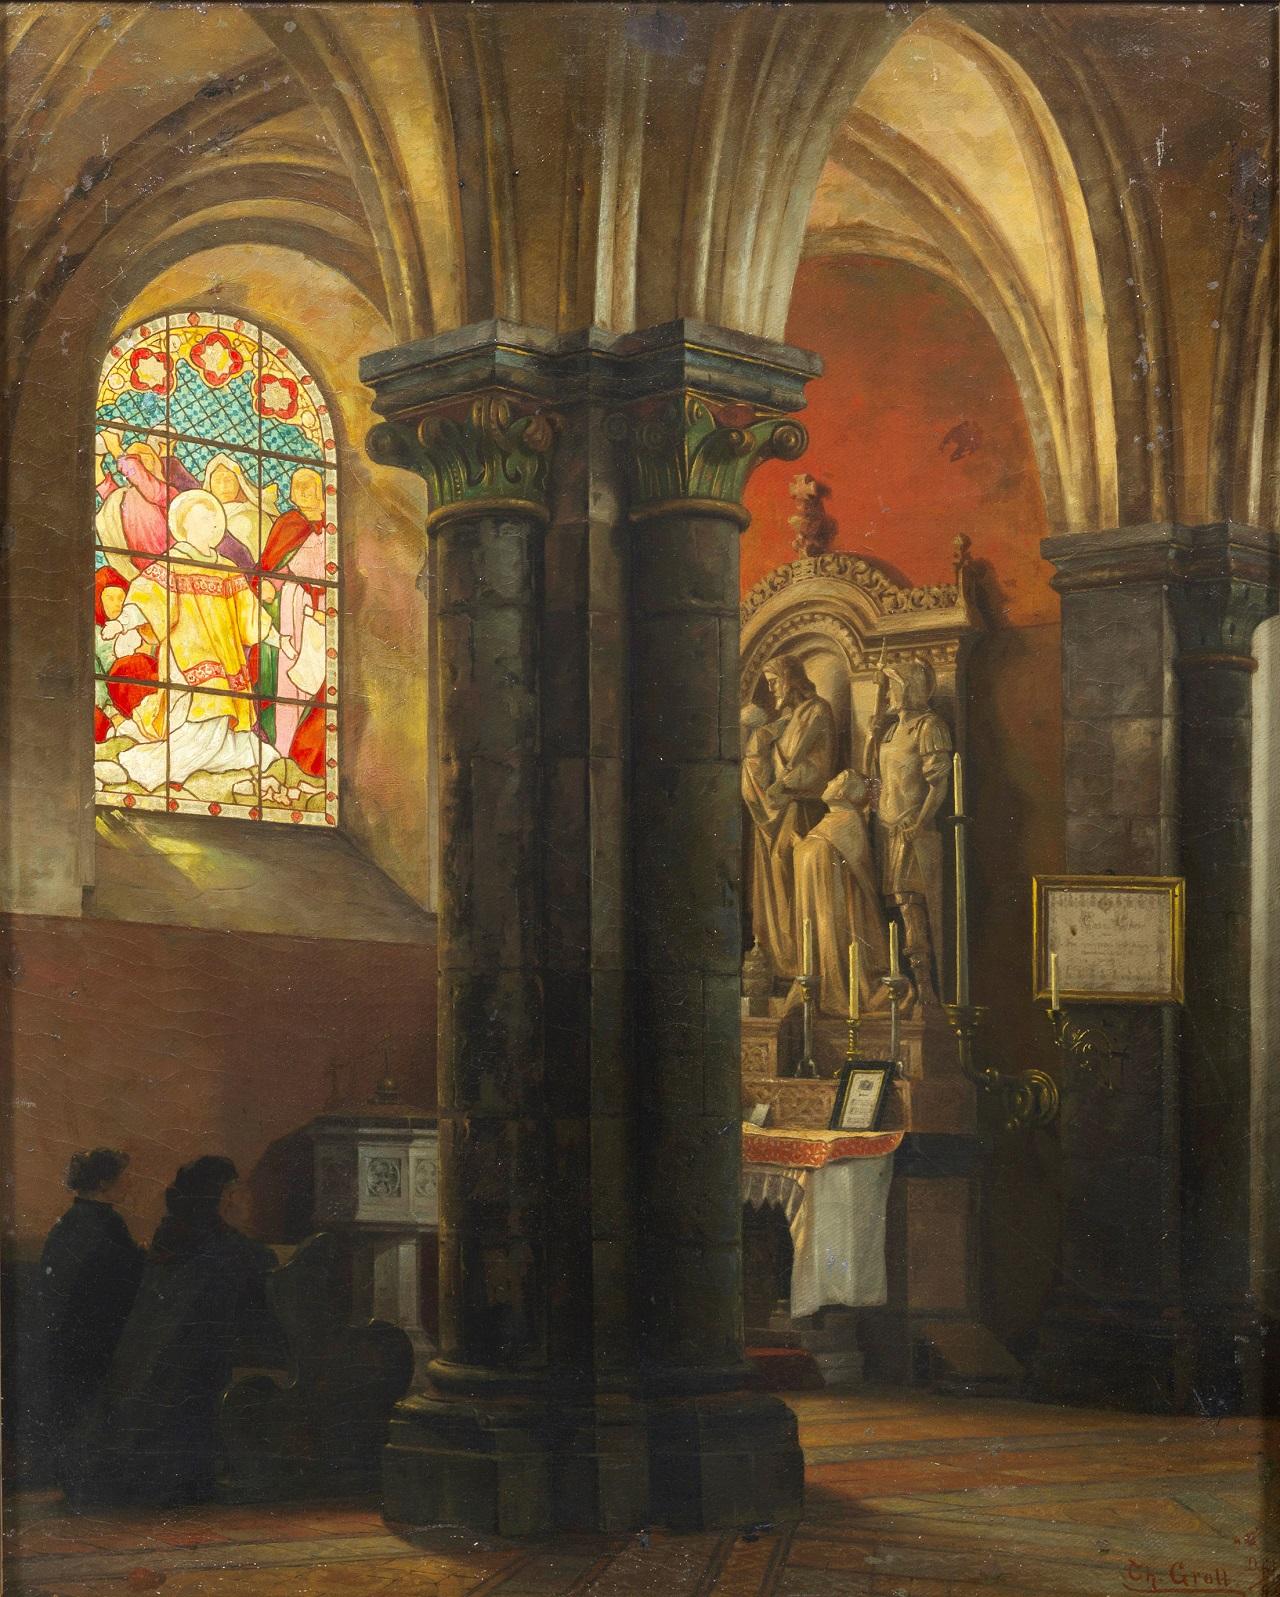 Theodor Groll. Kircheninneres. 1889. Öl / Leinwand. 58 x 48cm